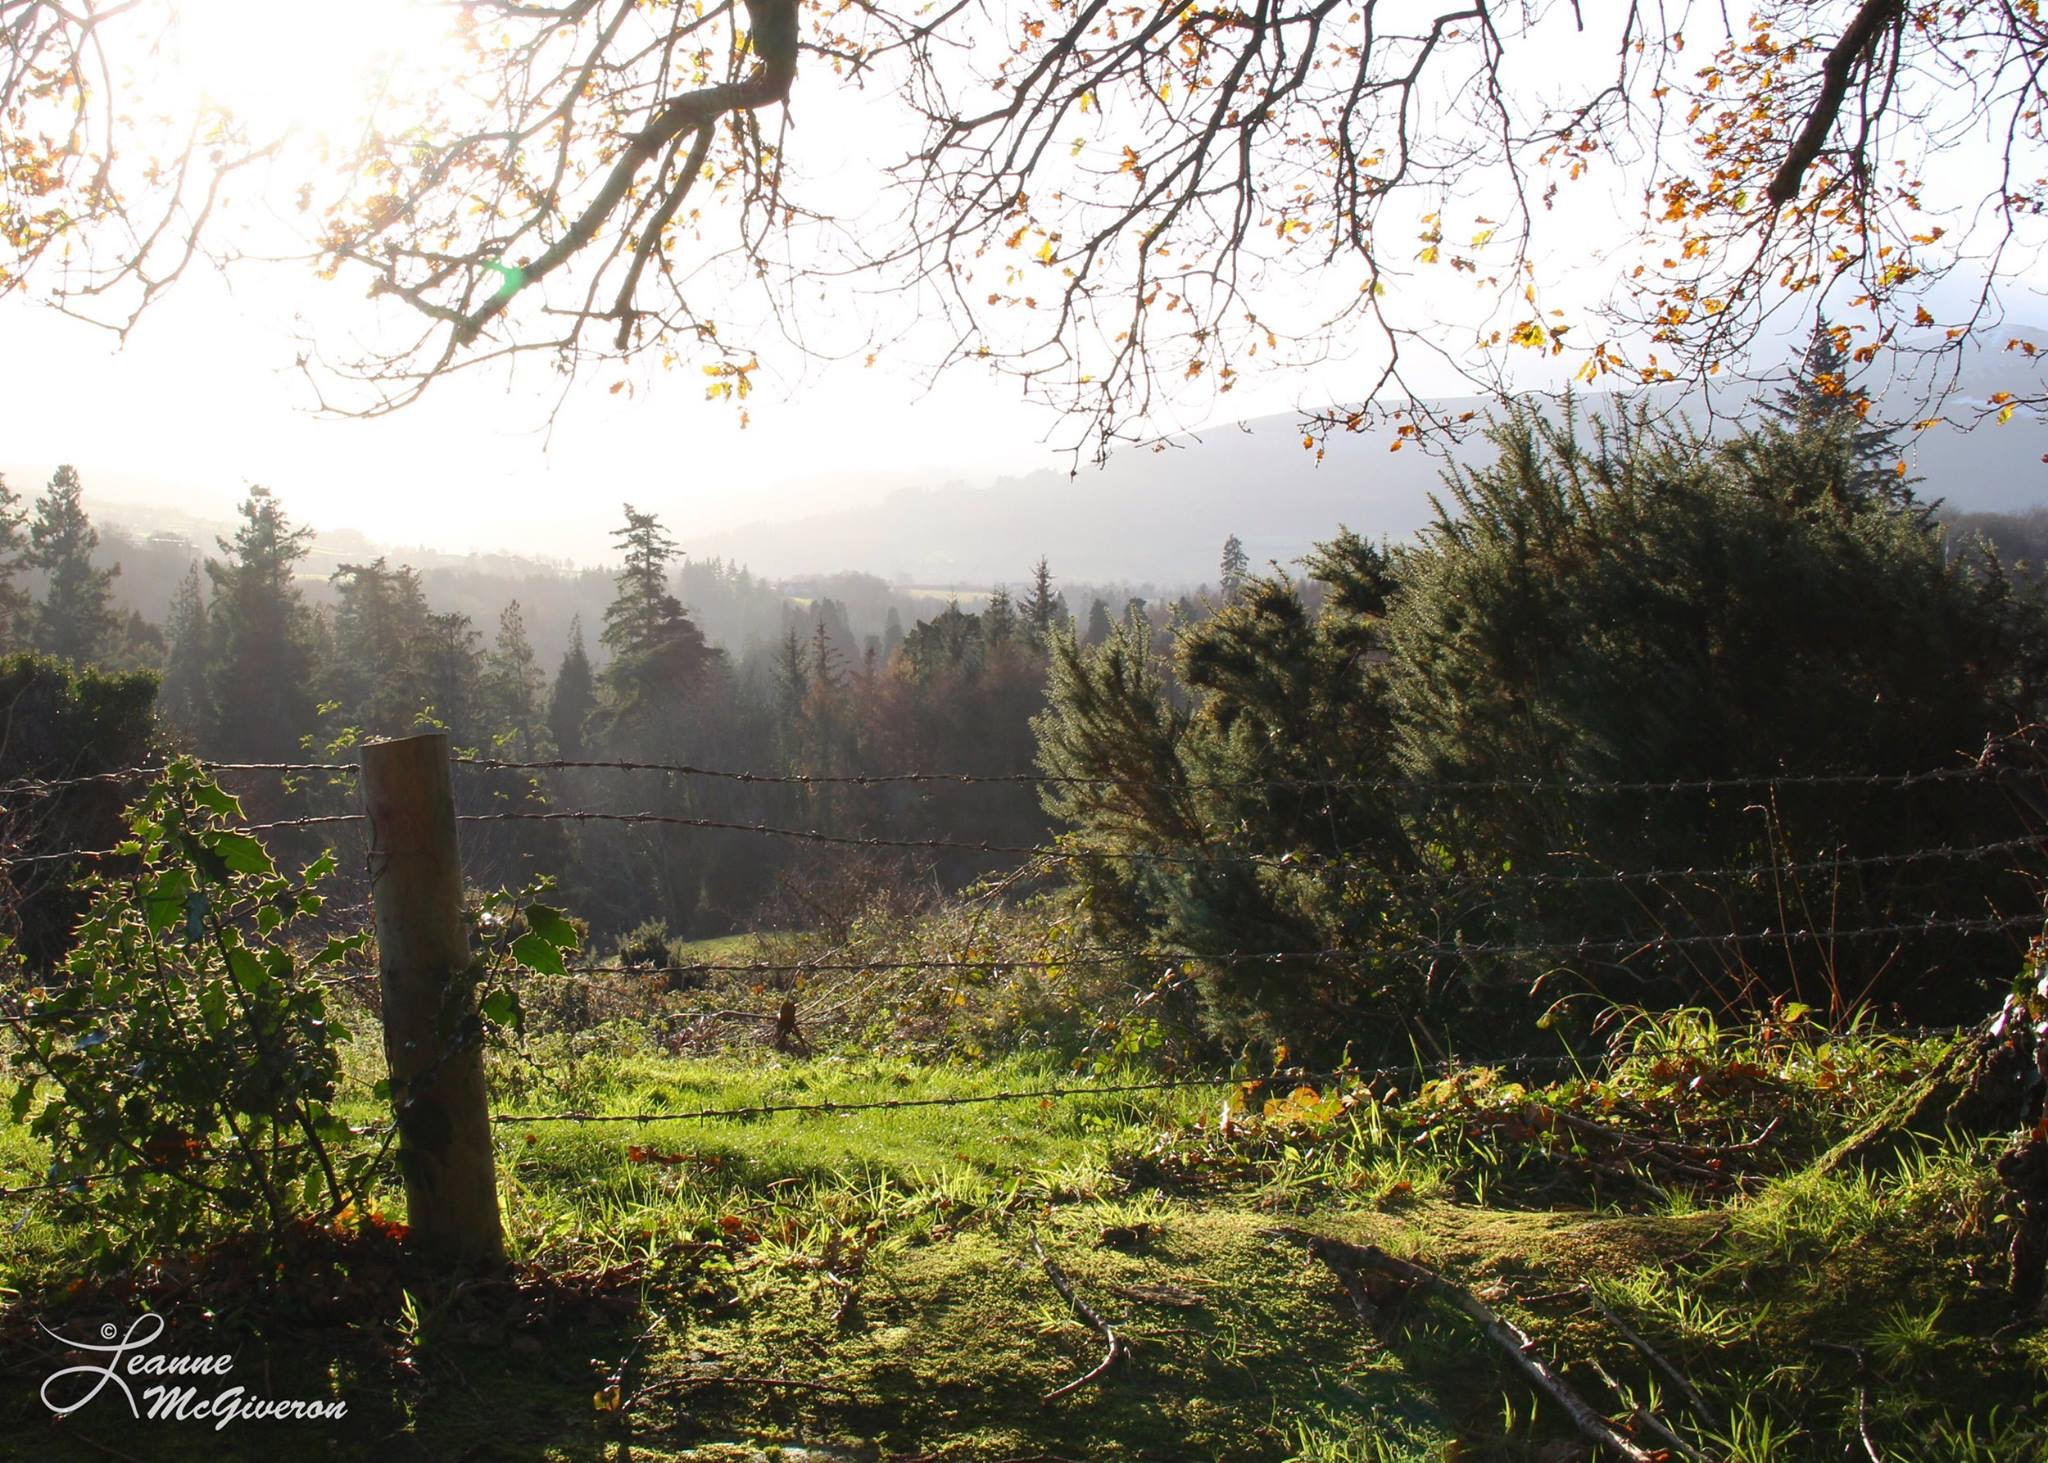 On the Edge of Powerscourt Estate